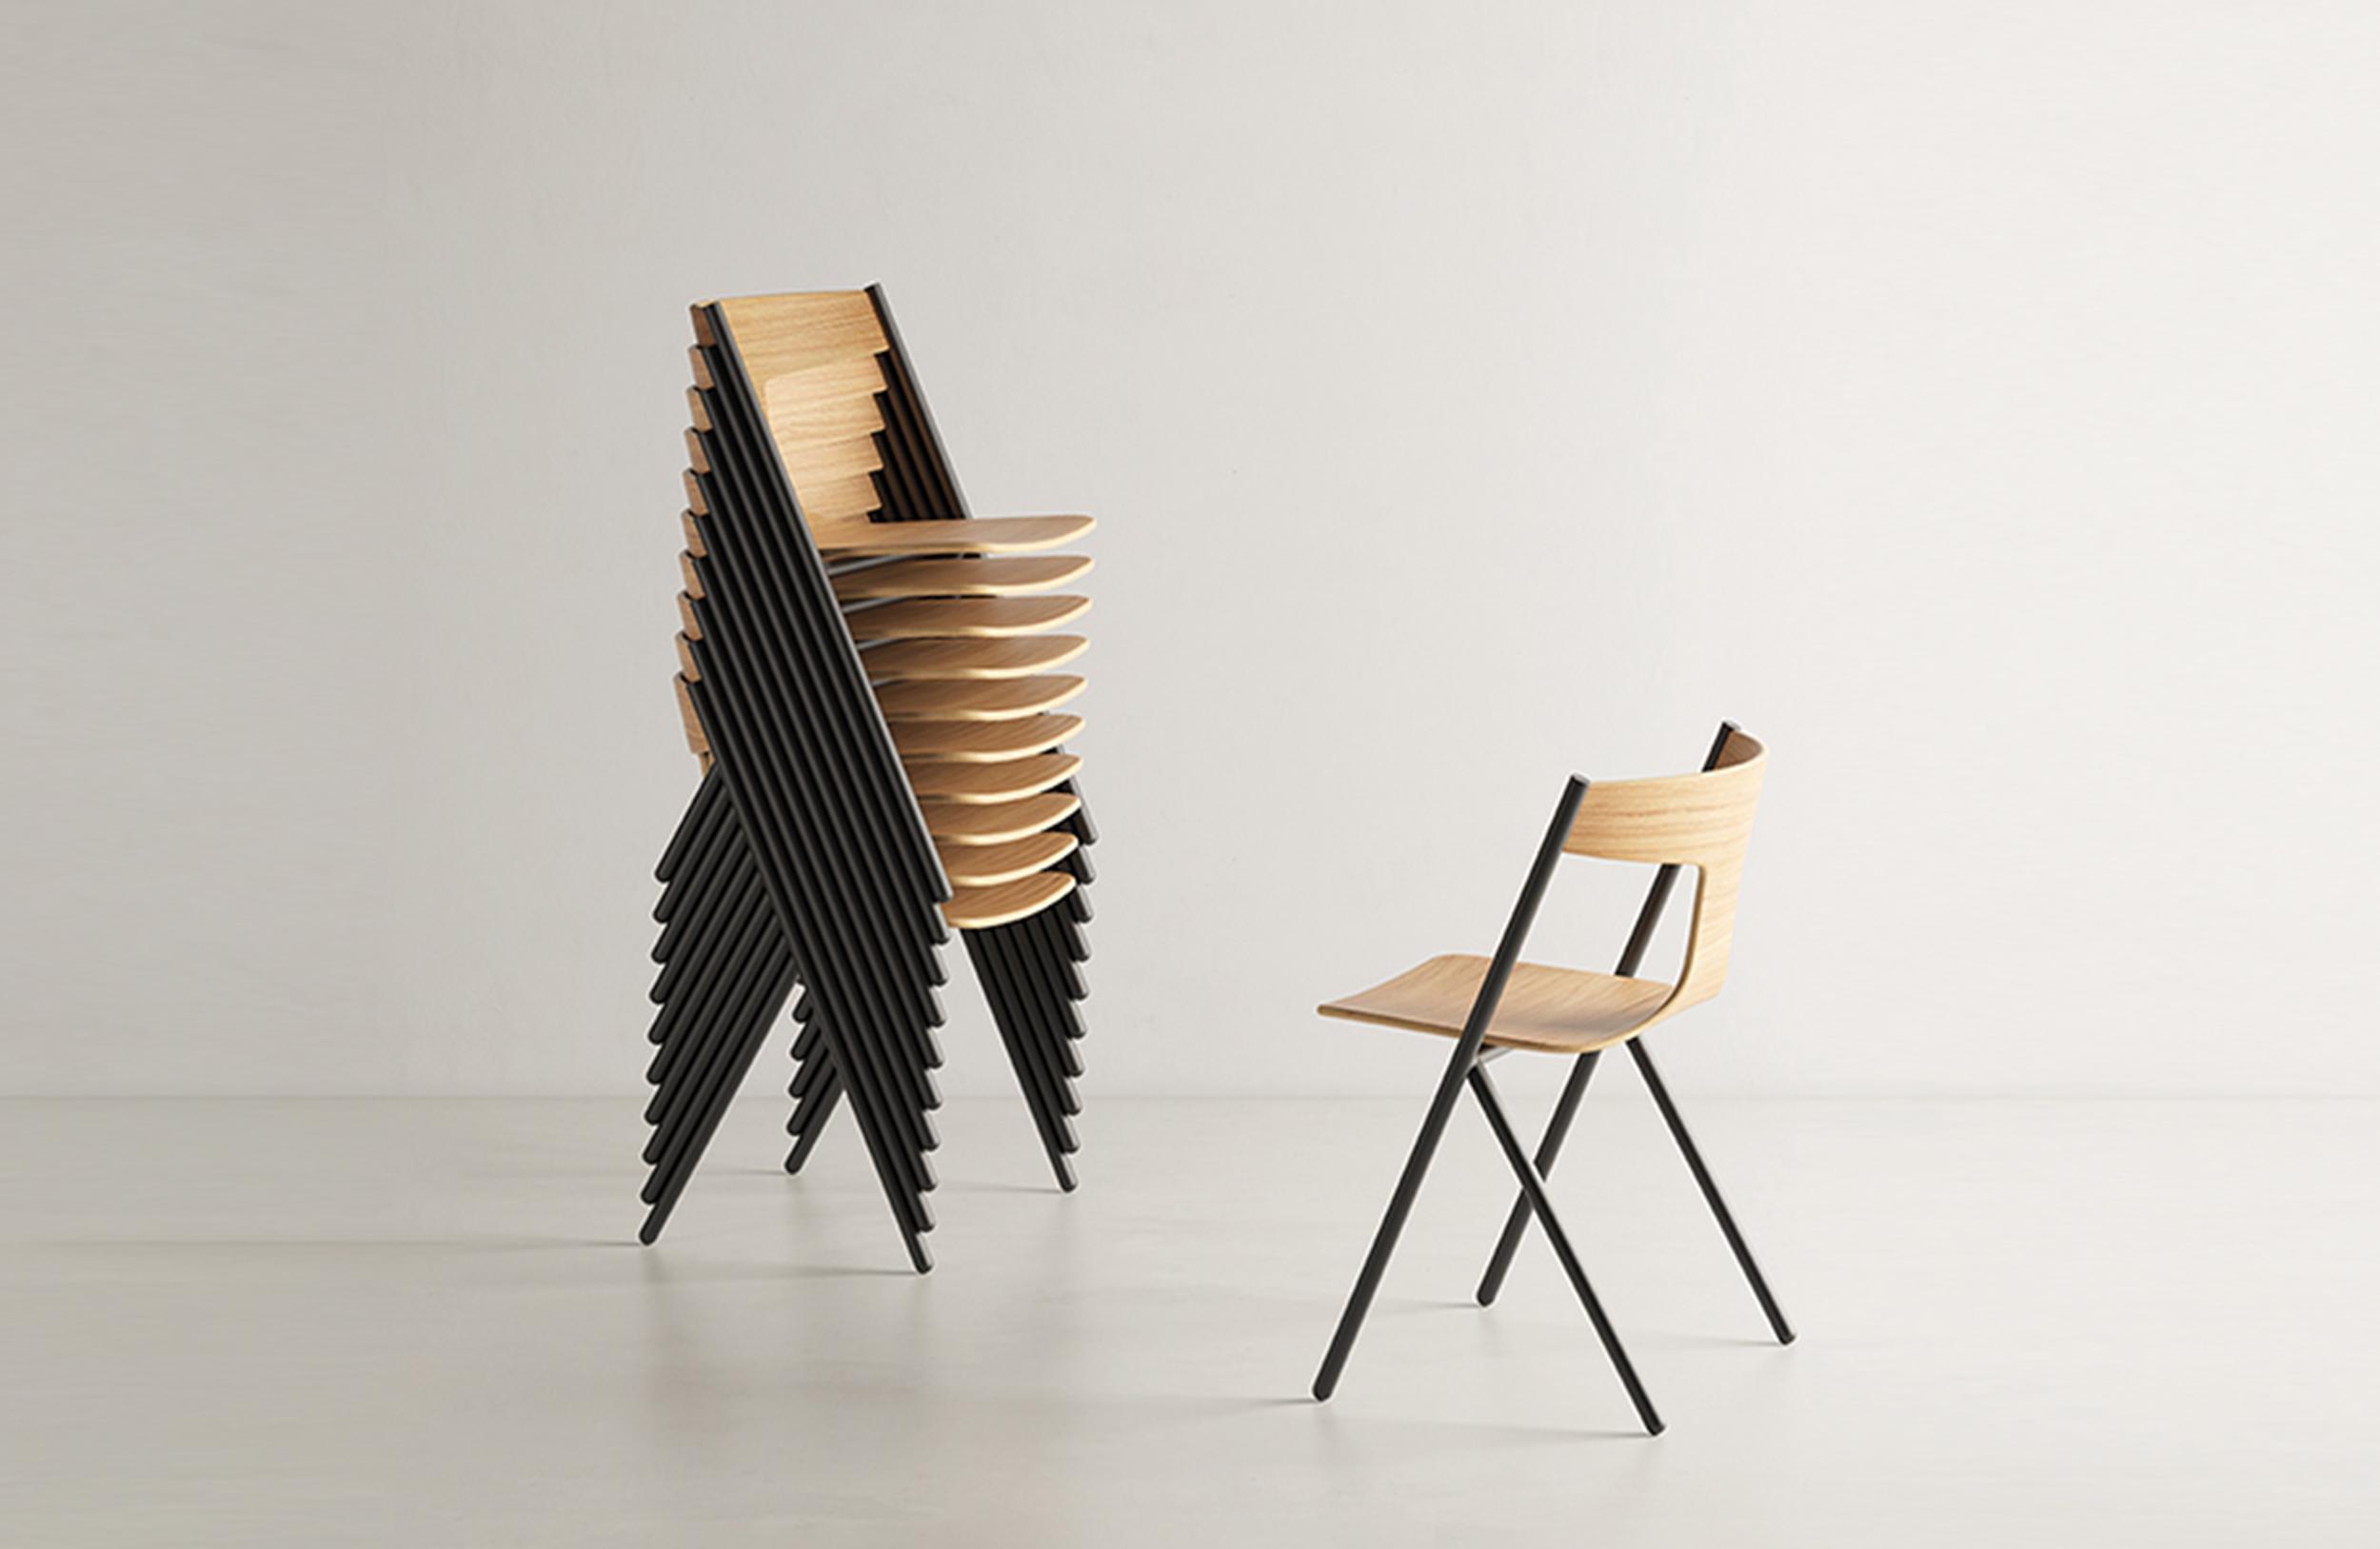 QUADRA餐椅/洽谈椅